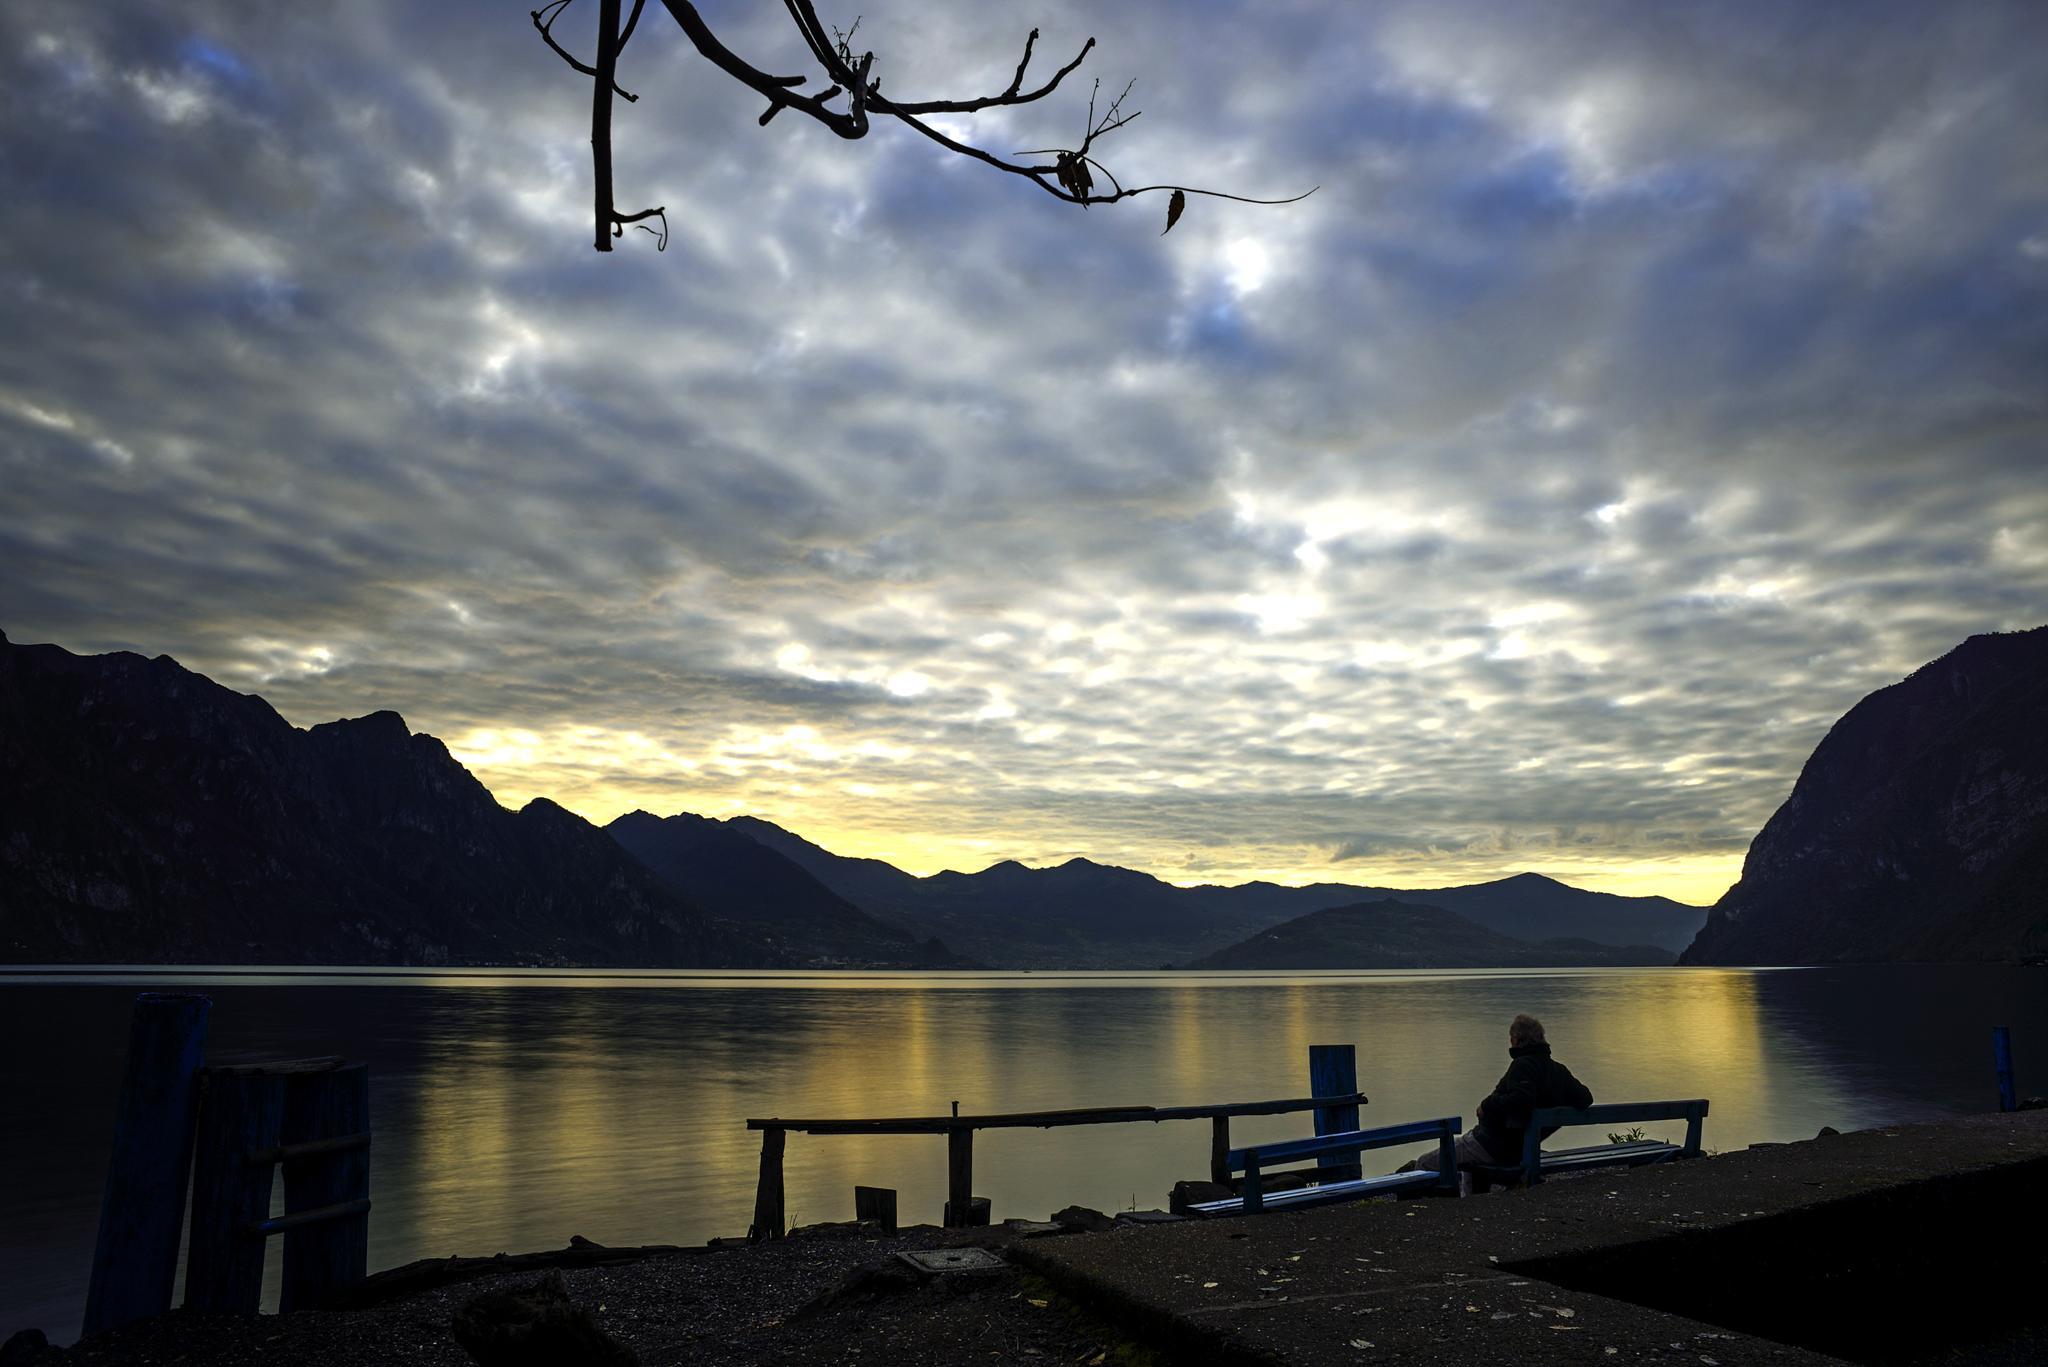 Peaceful dawn by roberto.fustinoni.60